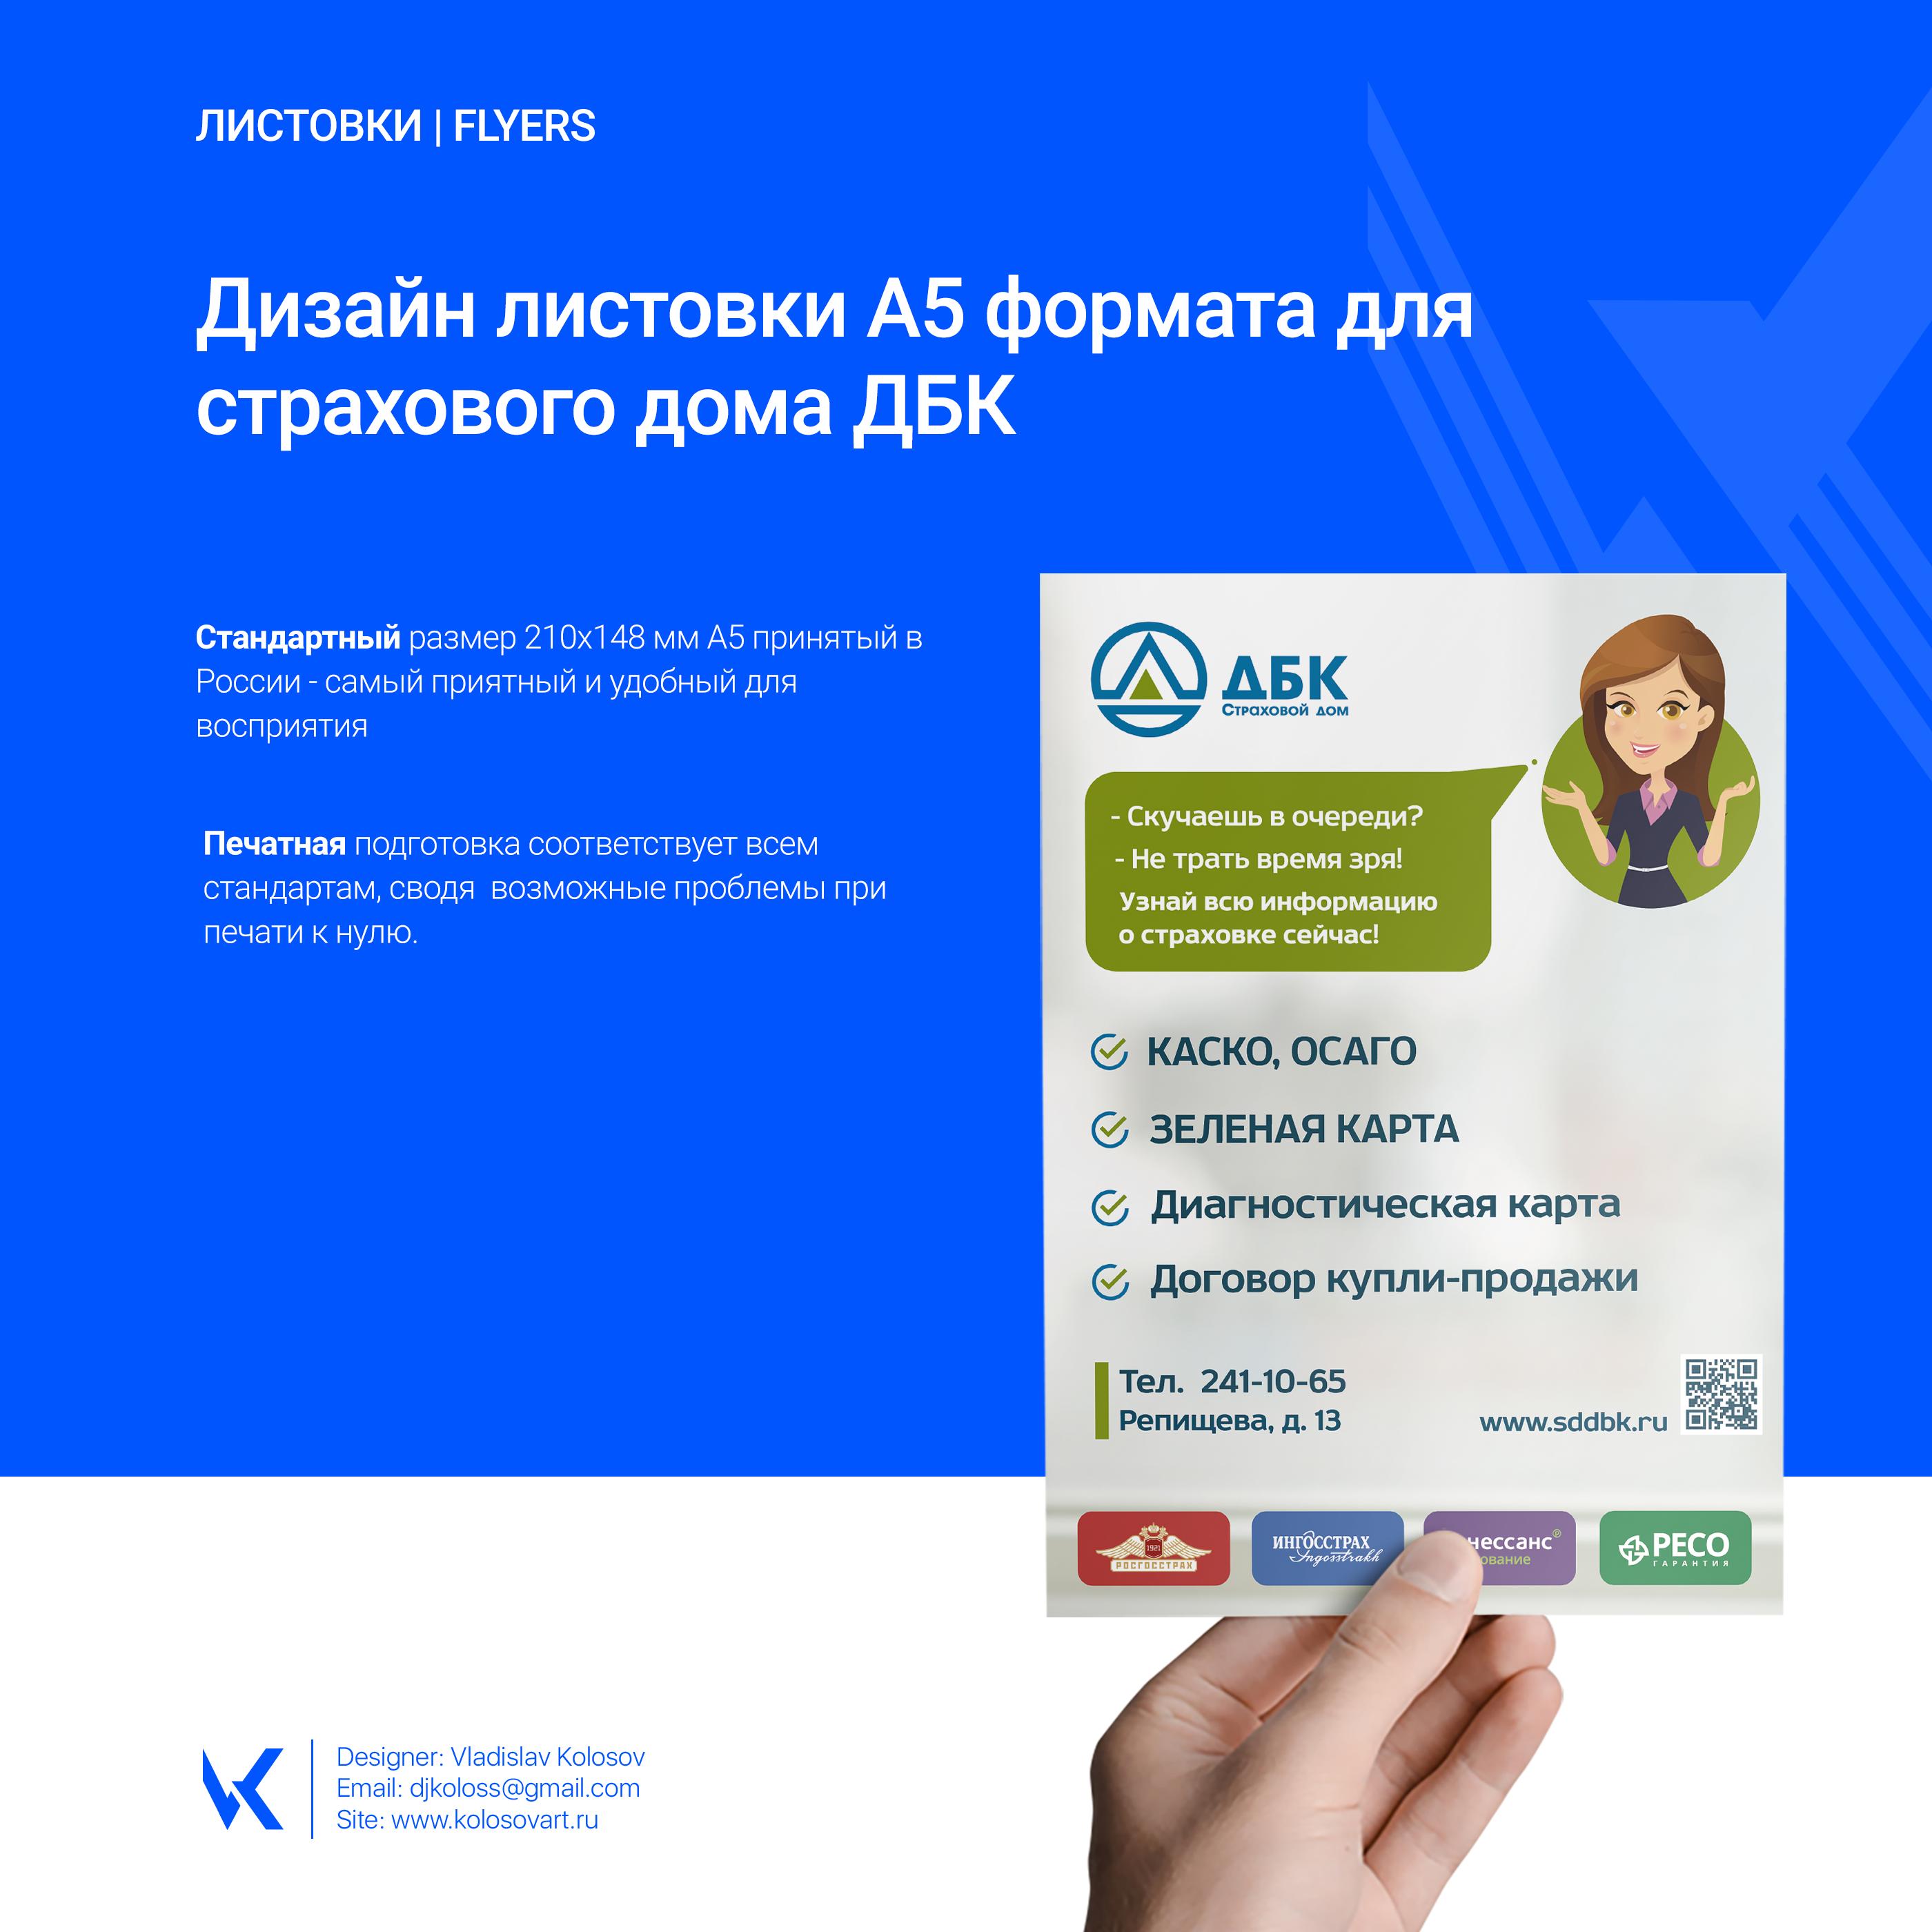 Дизайн плаката А5 формата для страхового дома ДБК